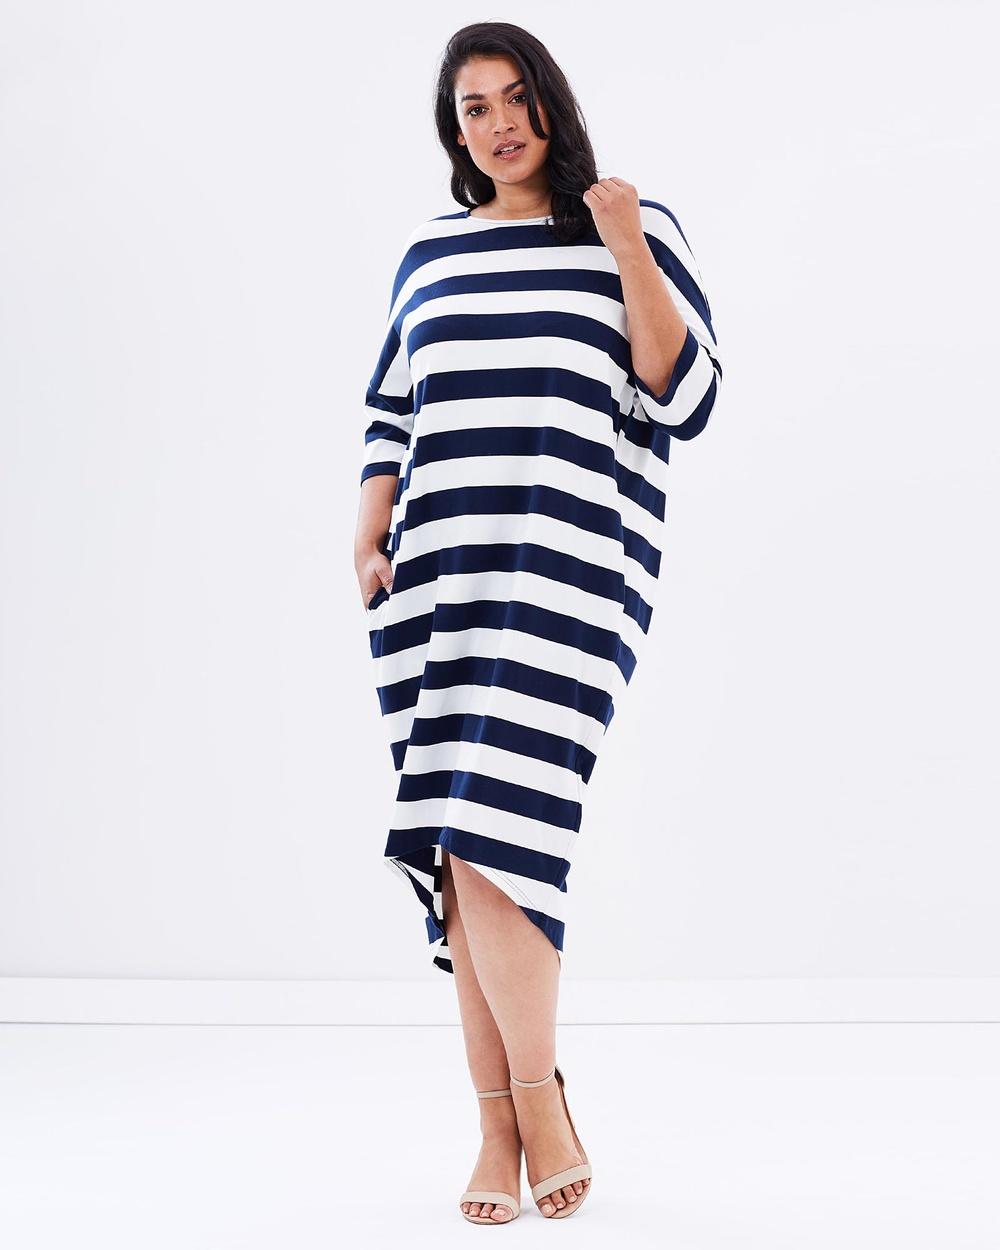 Advocado Plus Cocoon Dress Dresses Navy Stripe Cocoon Dress